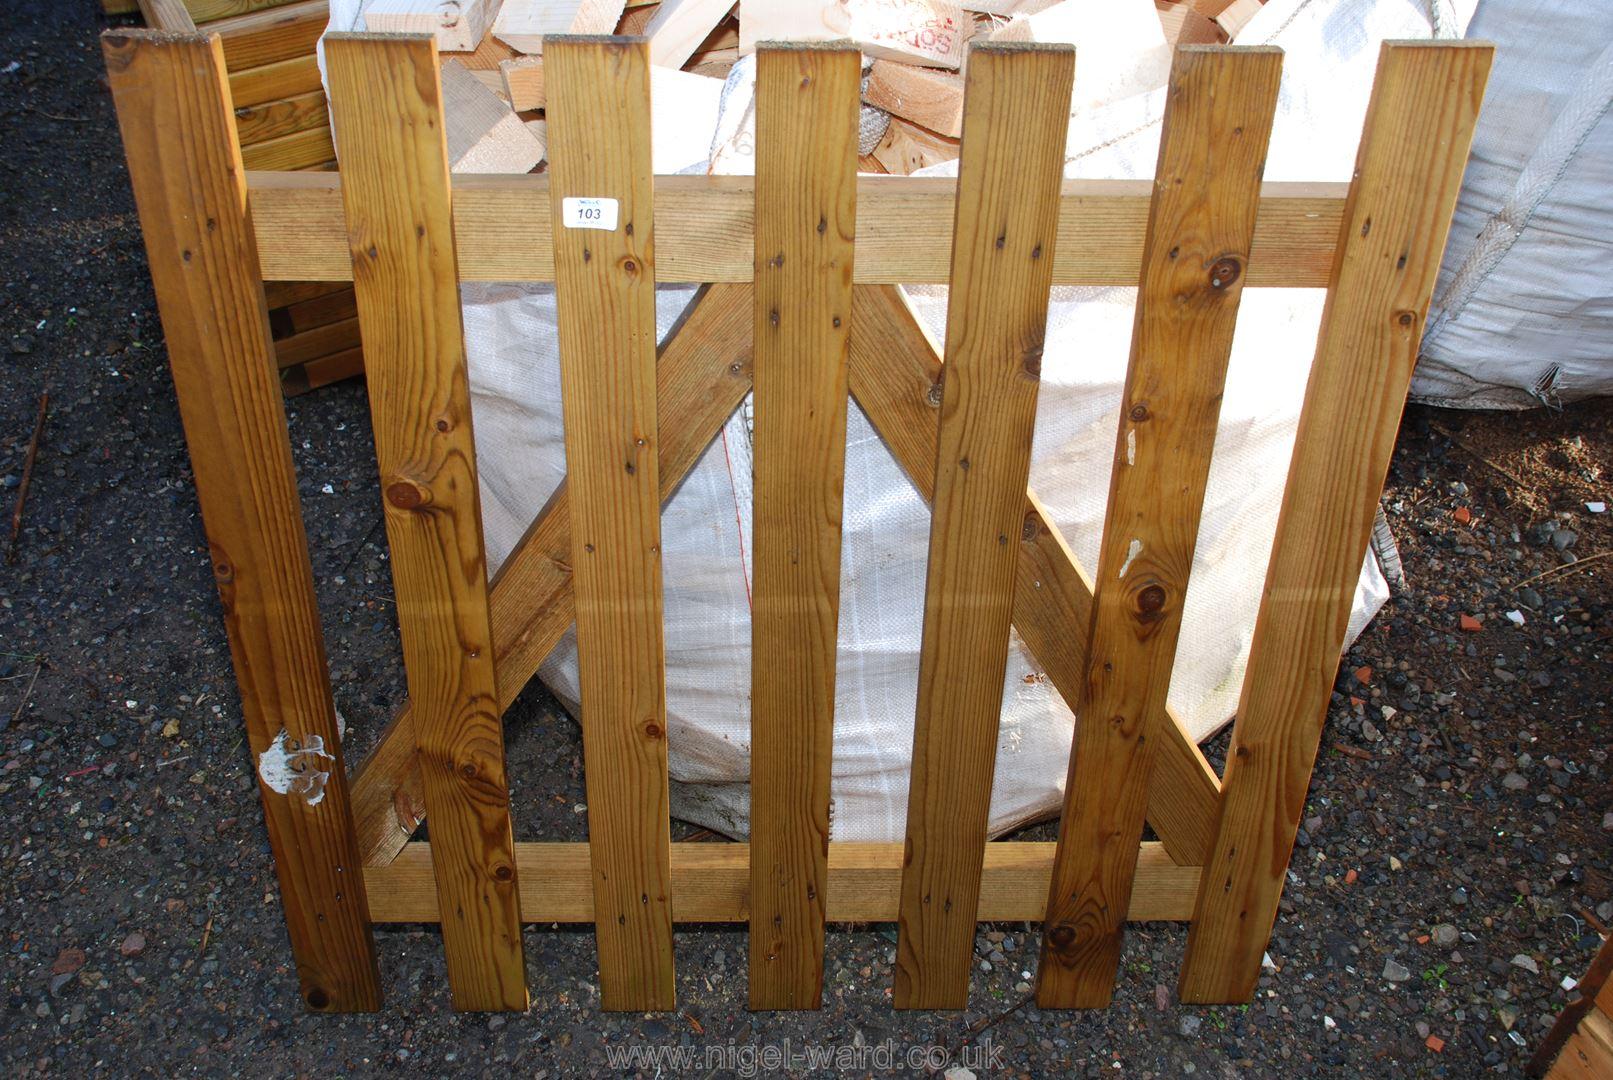 Single garden gate, 3' x 3'.